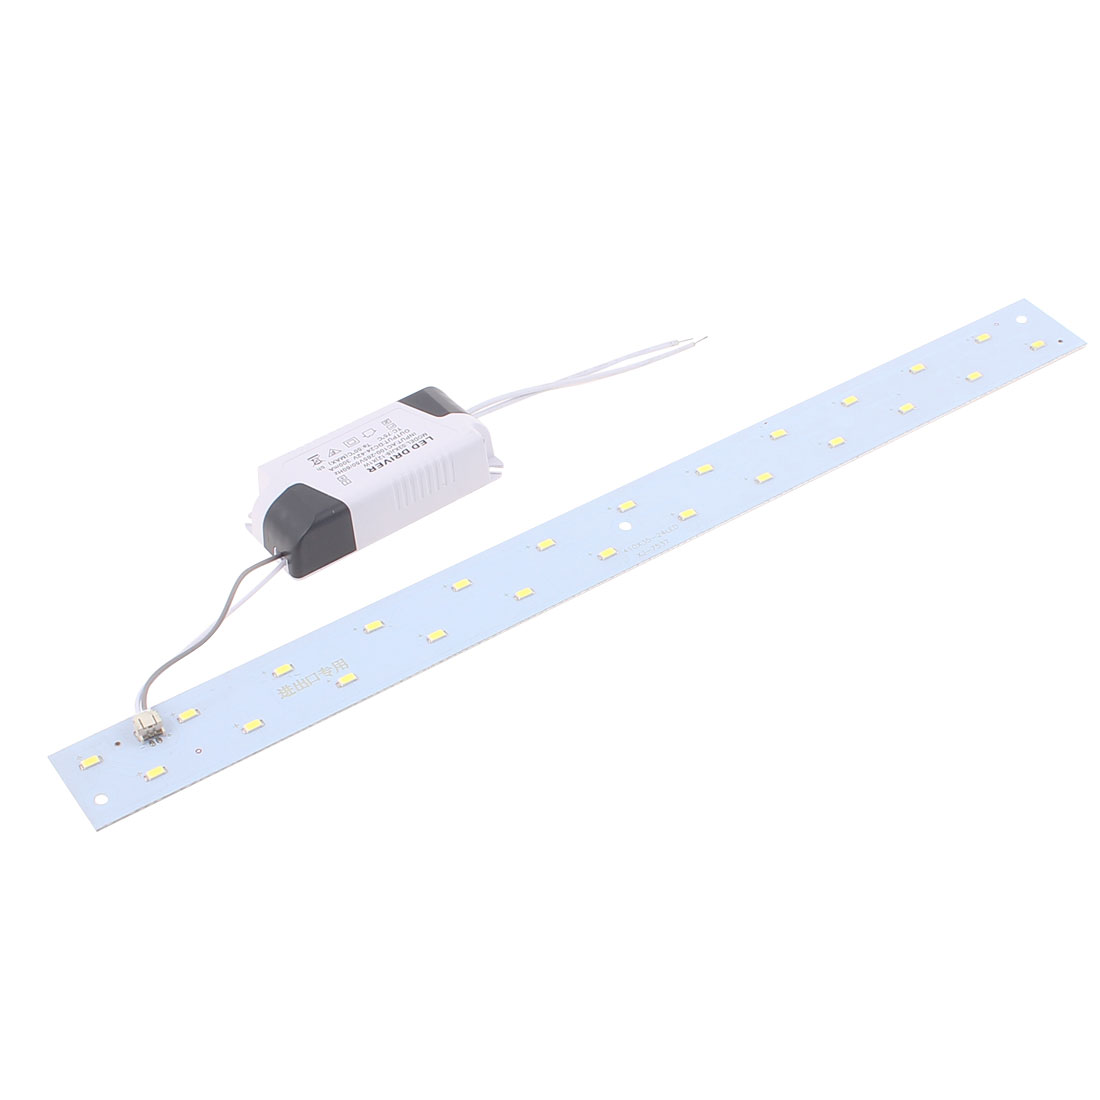 AC100~265V 12W LED Ceiling light Panel 2 Rows Long Strip Retrofit Plate Pure White 40cm